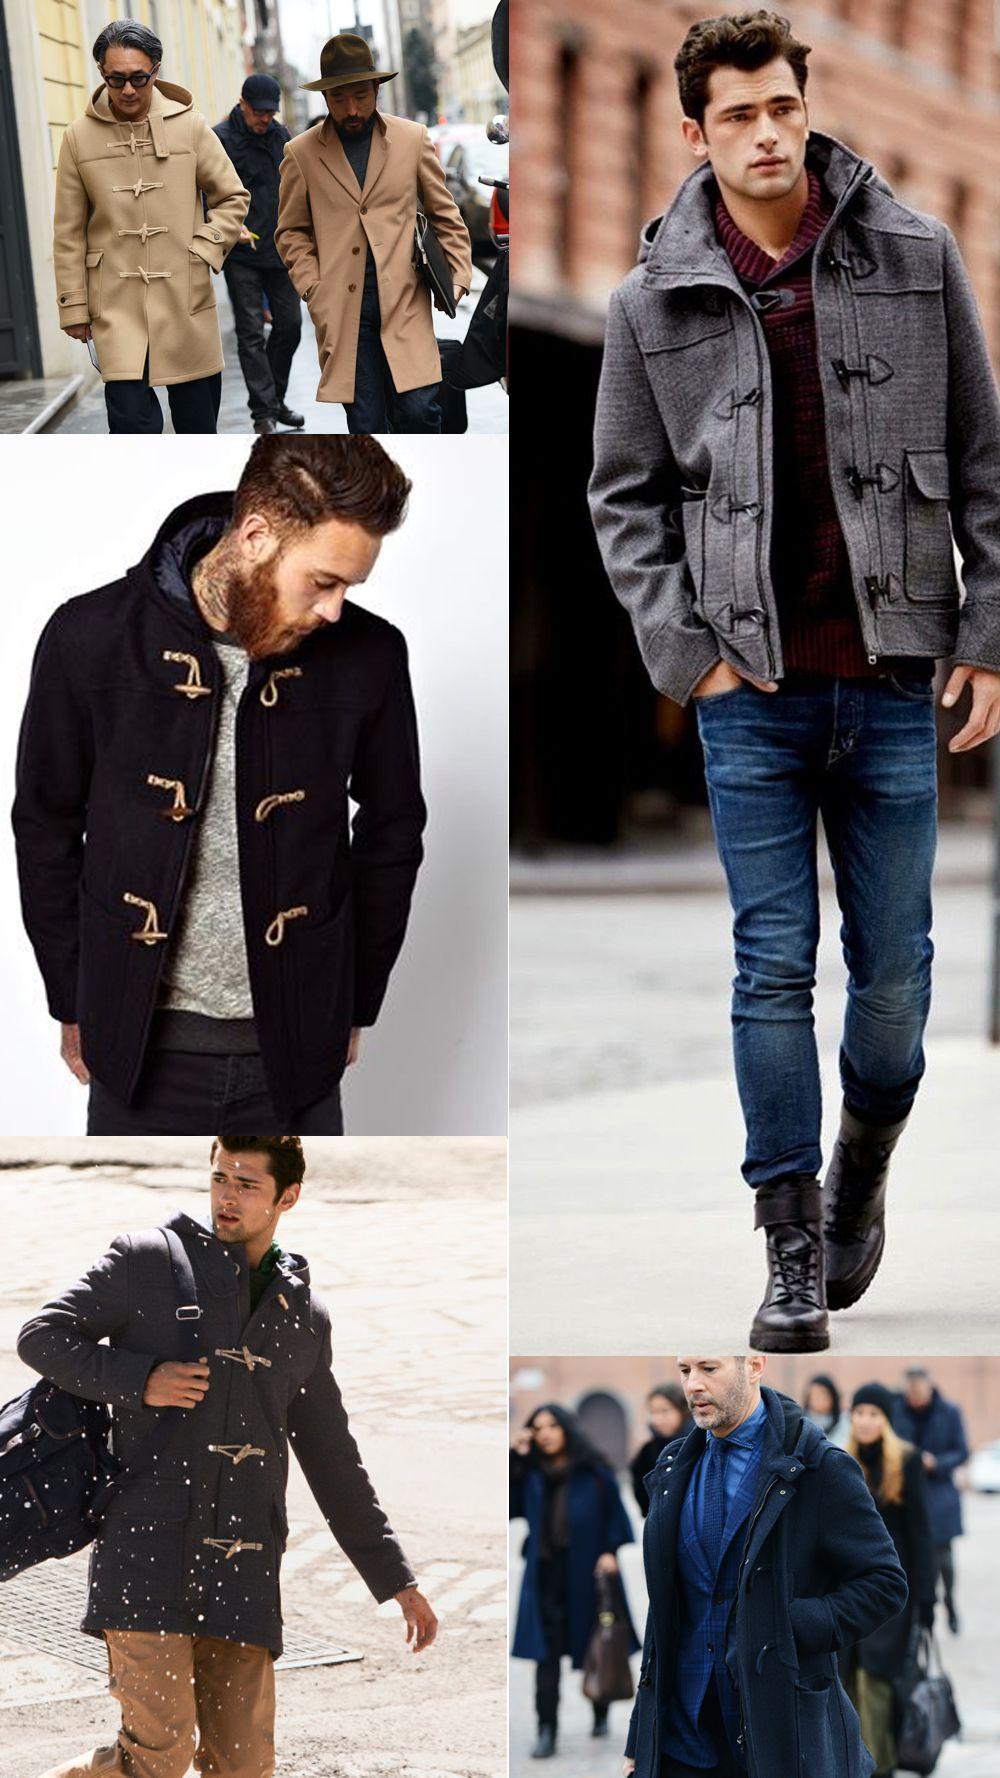 The Best Winter Coats in 2017 - Best Winter Jackets For Men ...